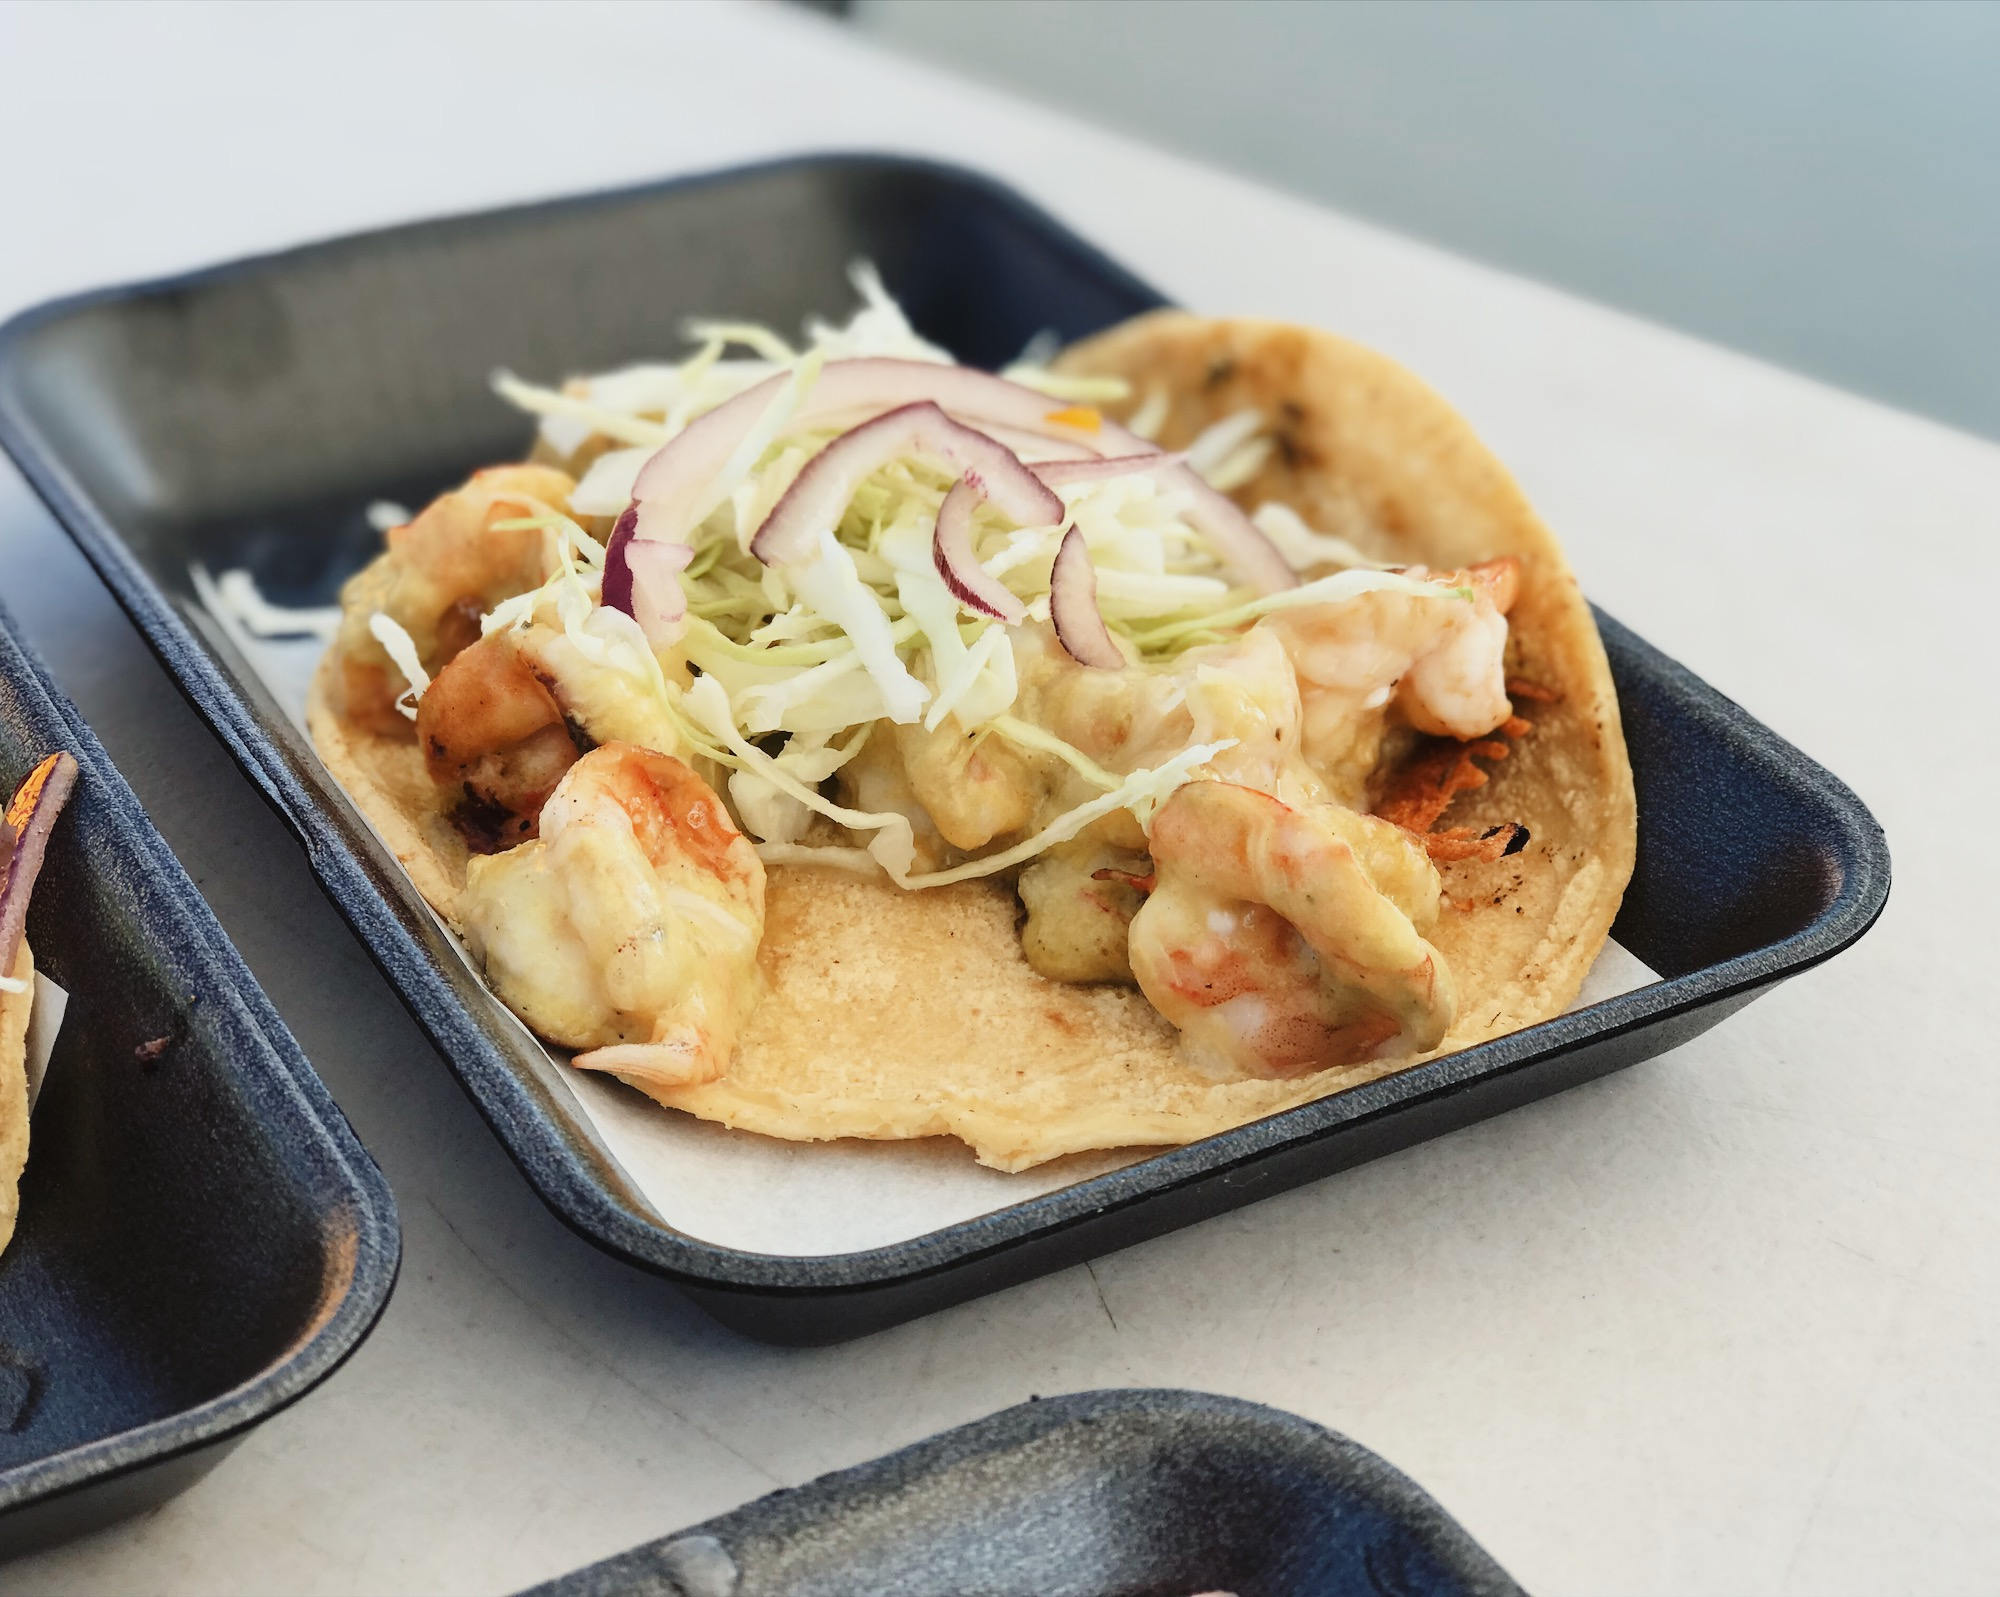 Taco Culichi (Shrimp in poblano sauce) | ©Life & Food